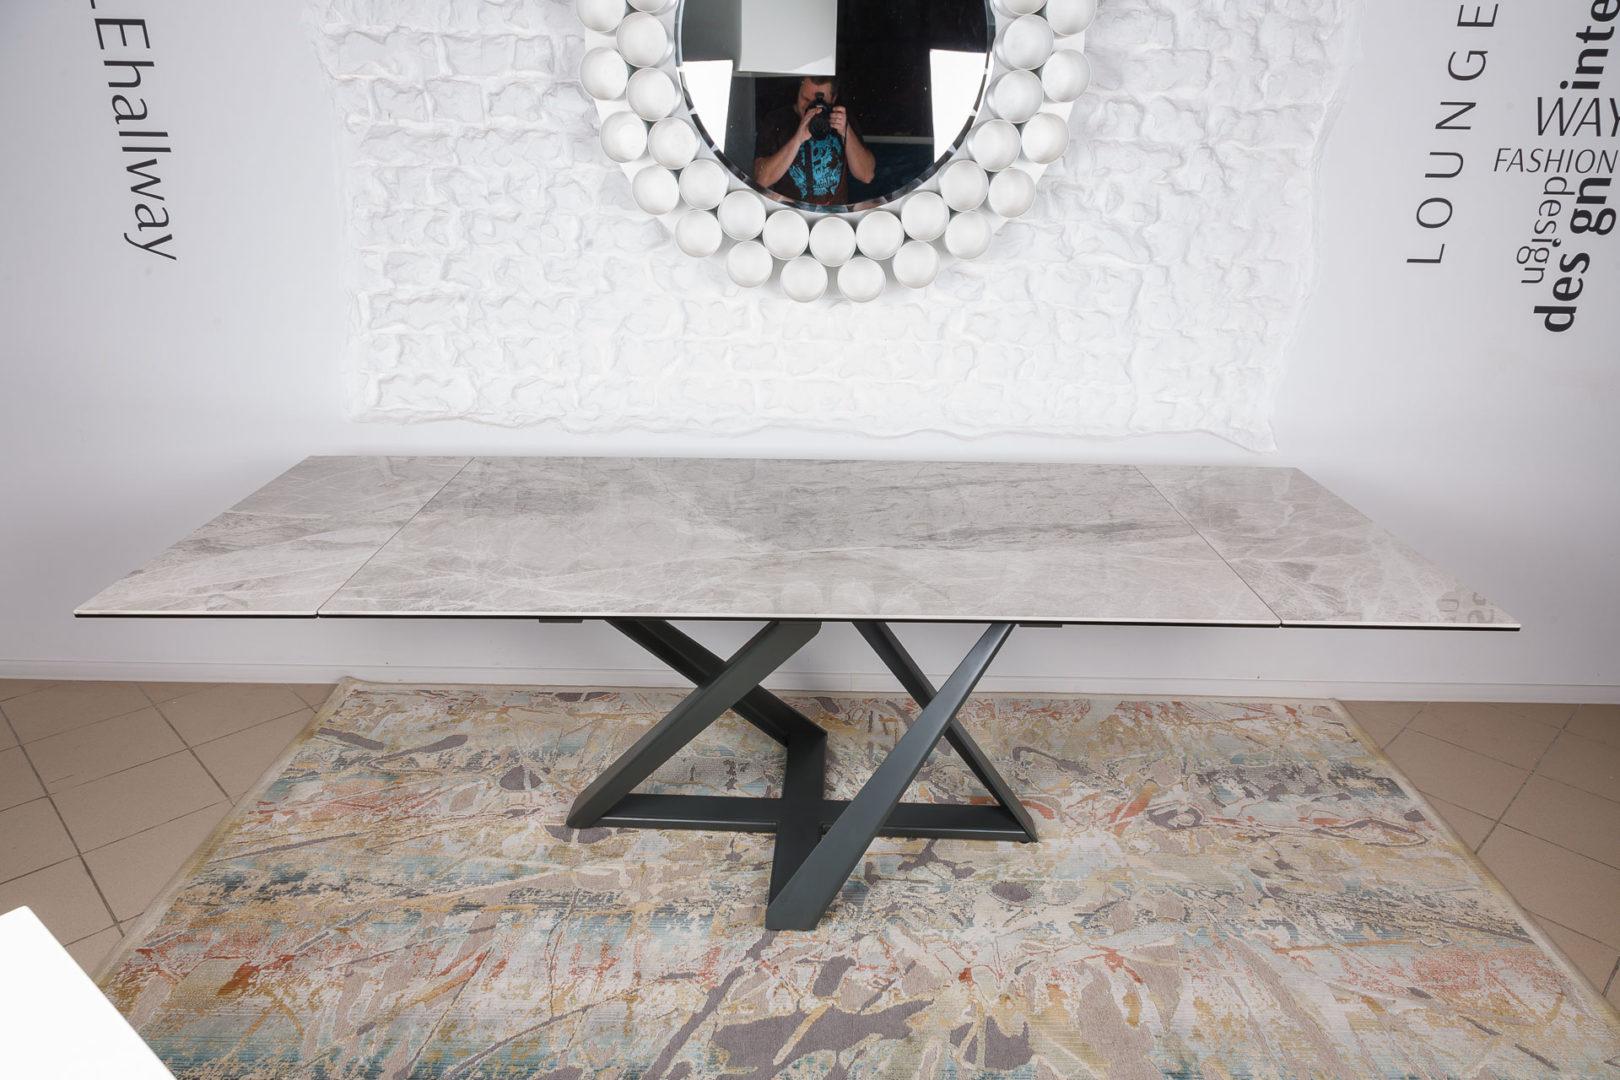 Стол Nicolas Fleetwood  NEW 4697L светло-серый глянец керамика